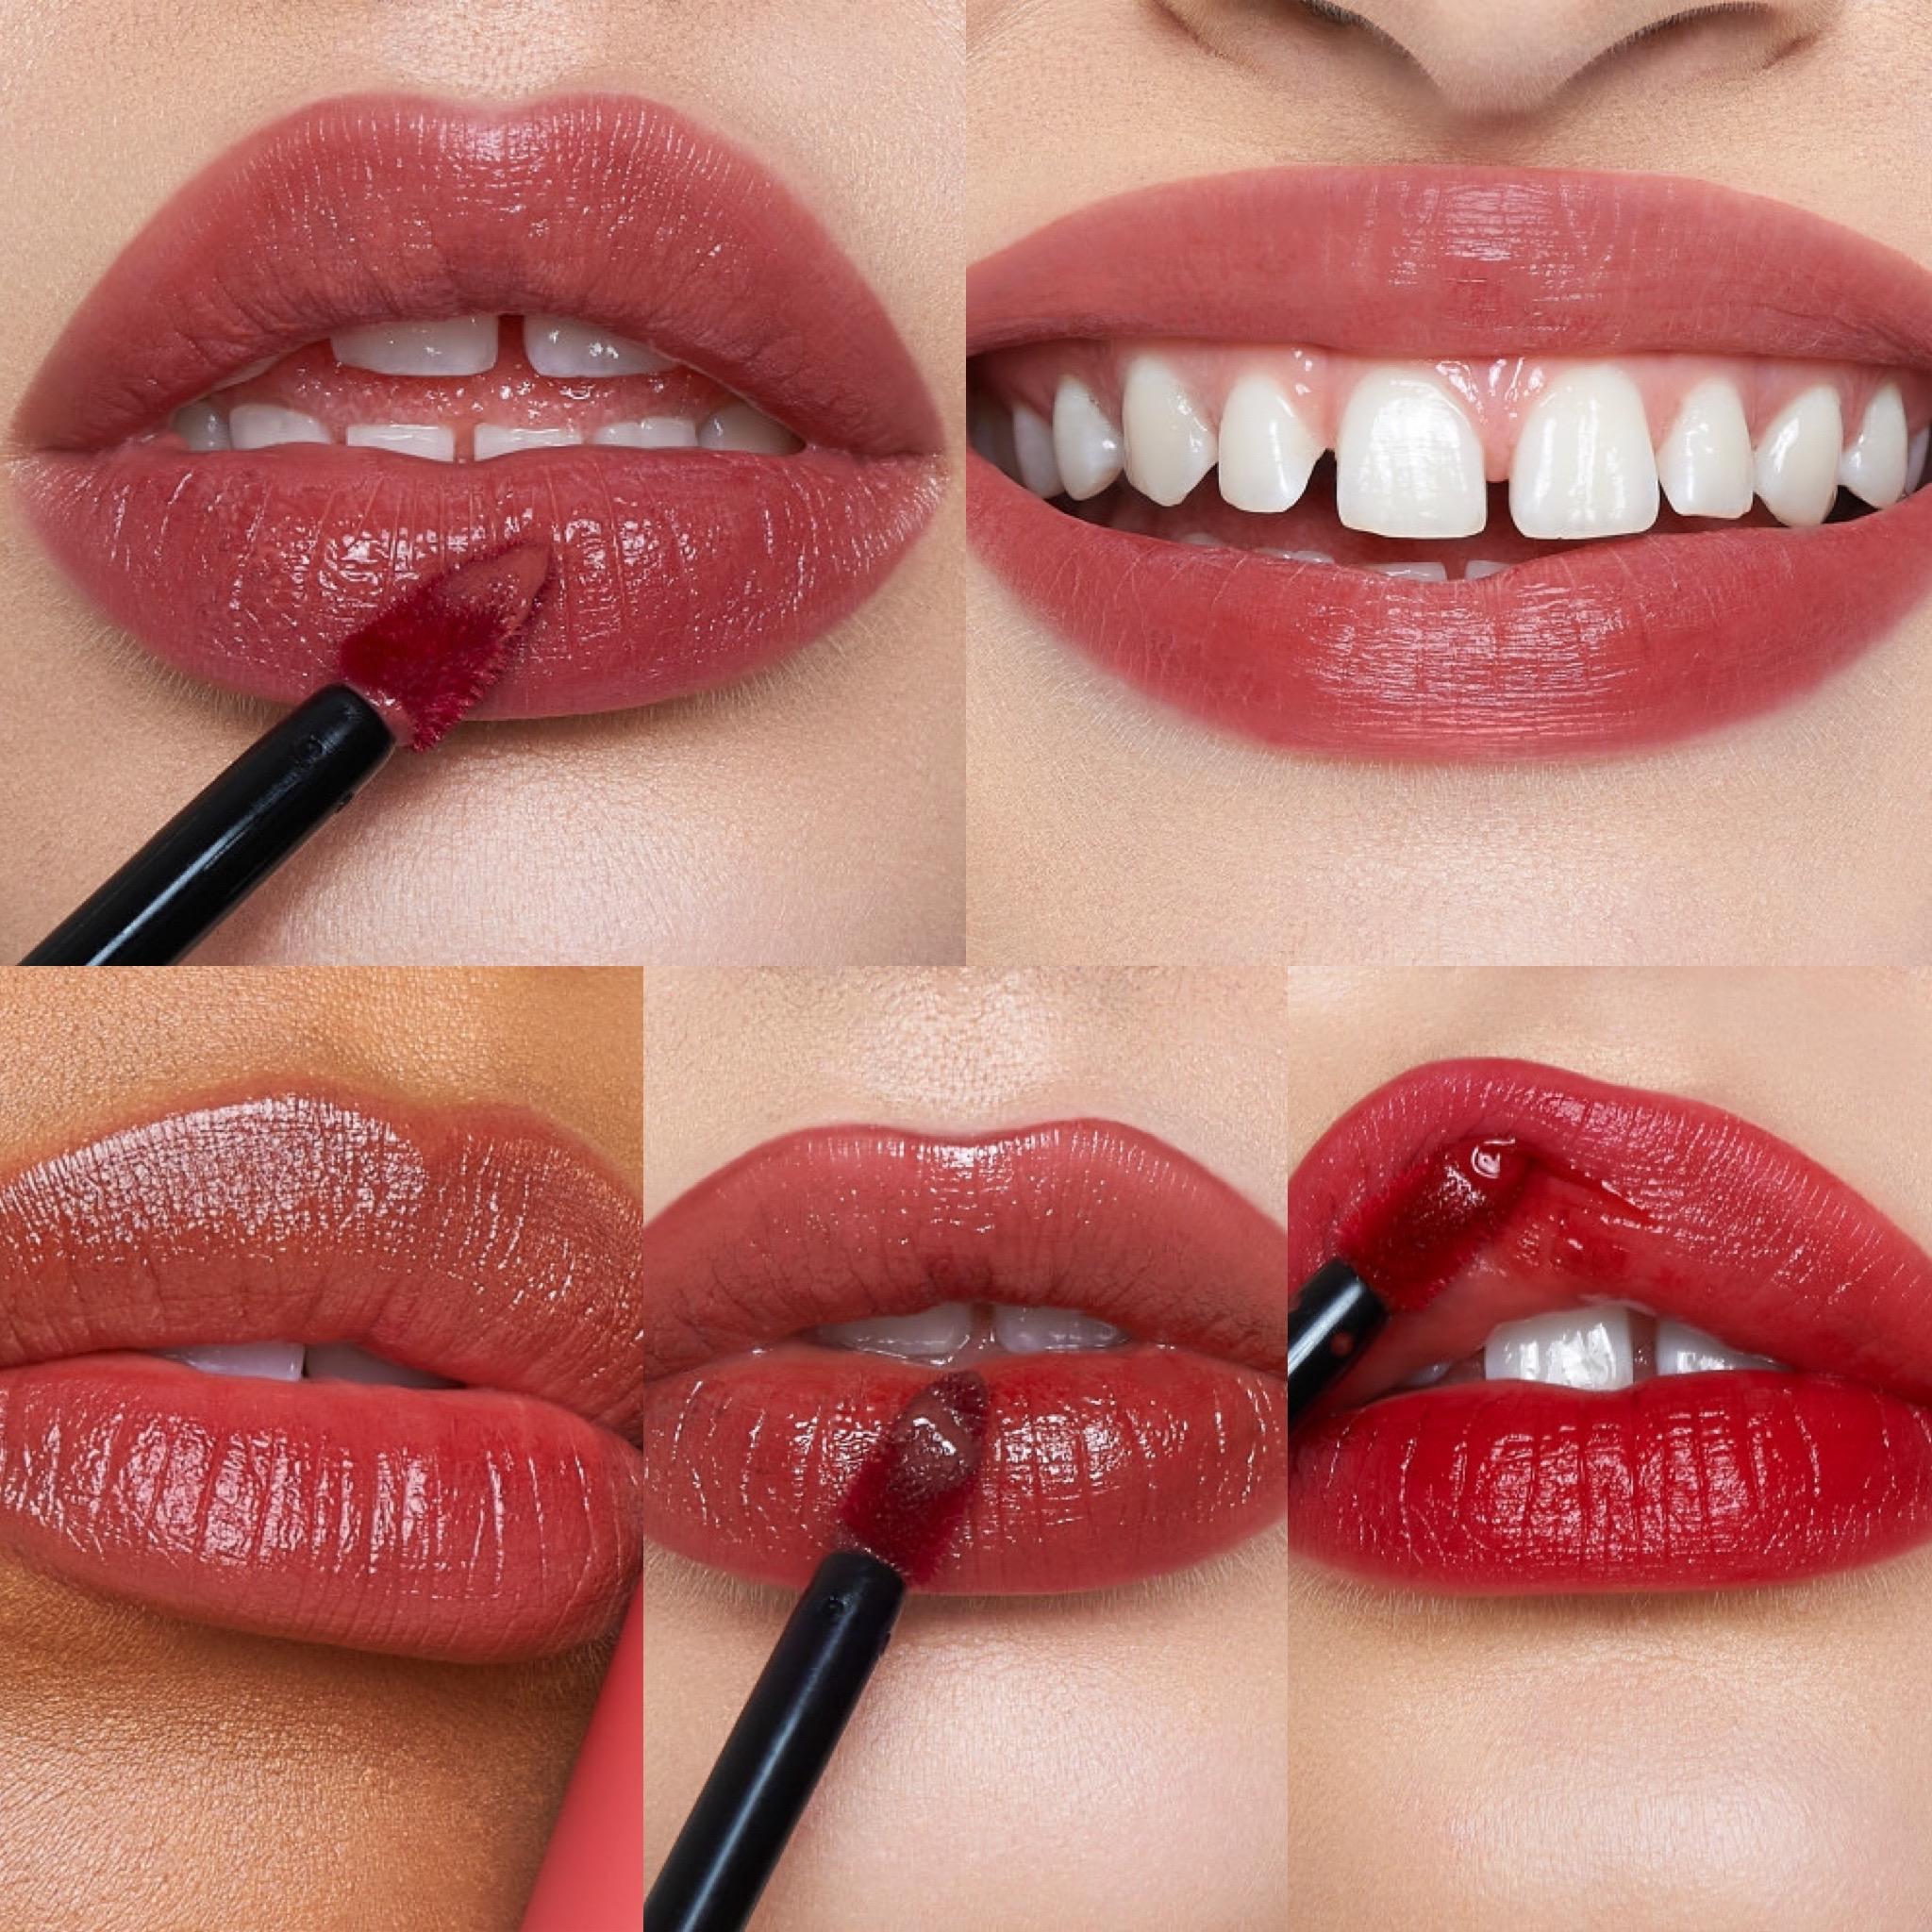 Charlotte Tilbury Tinted Love Lip & Cheek Duo